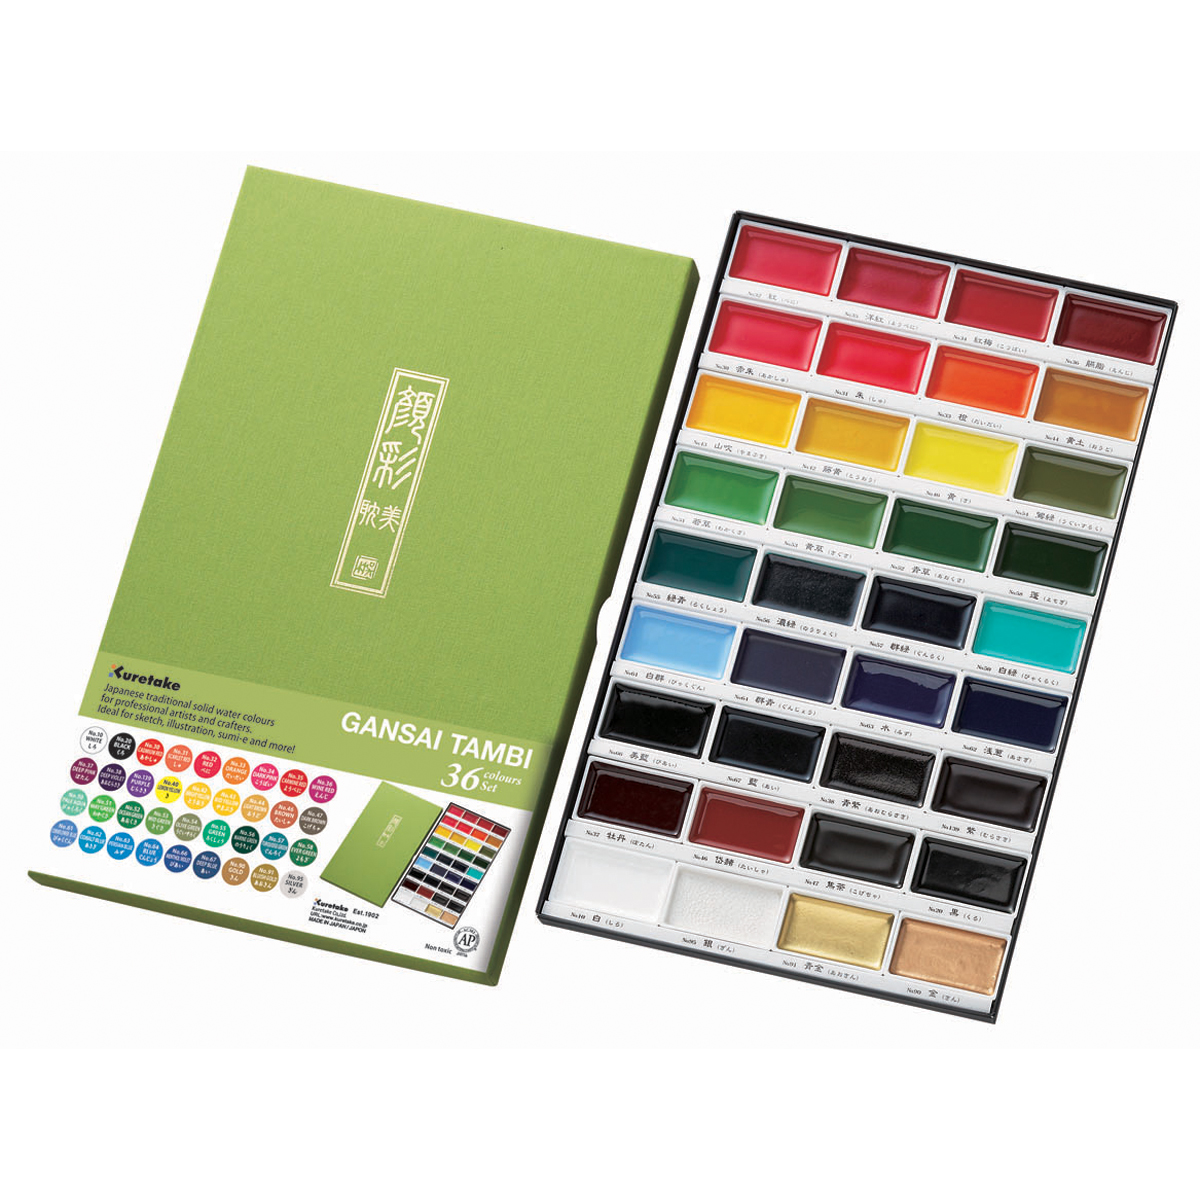 Kuretake Gansai Tambi 36 Color Set-